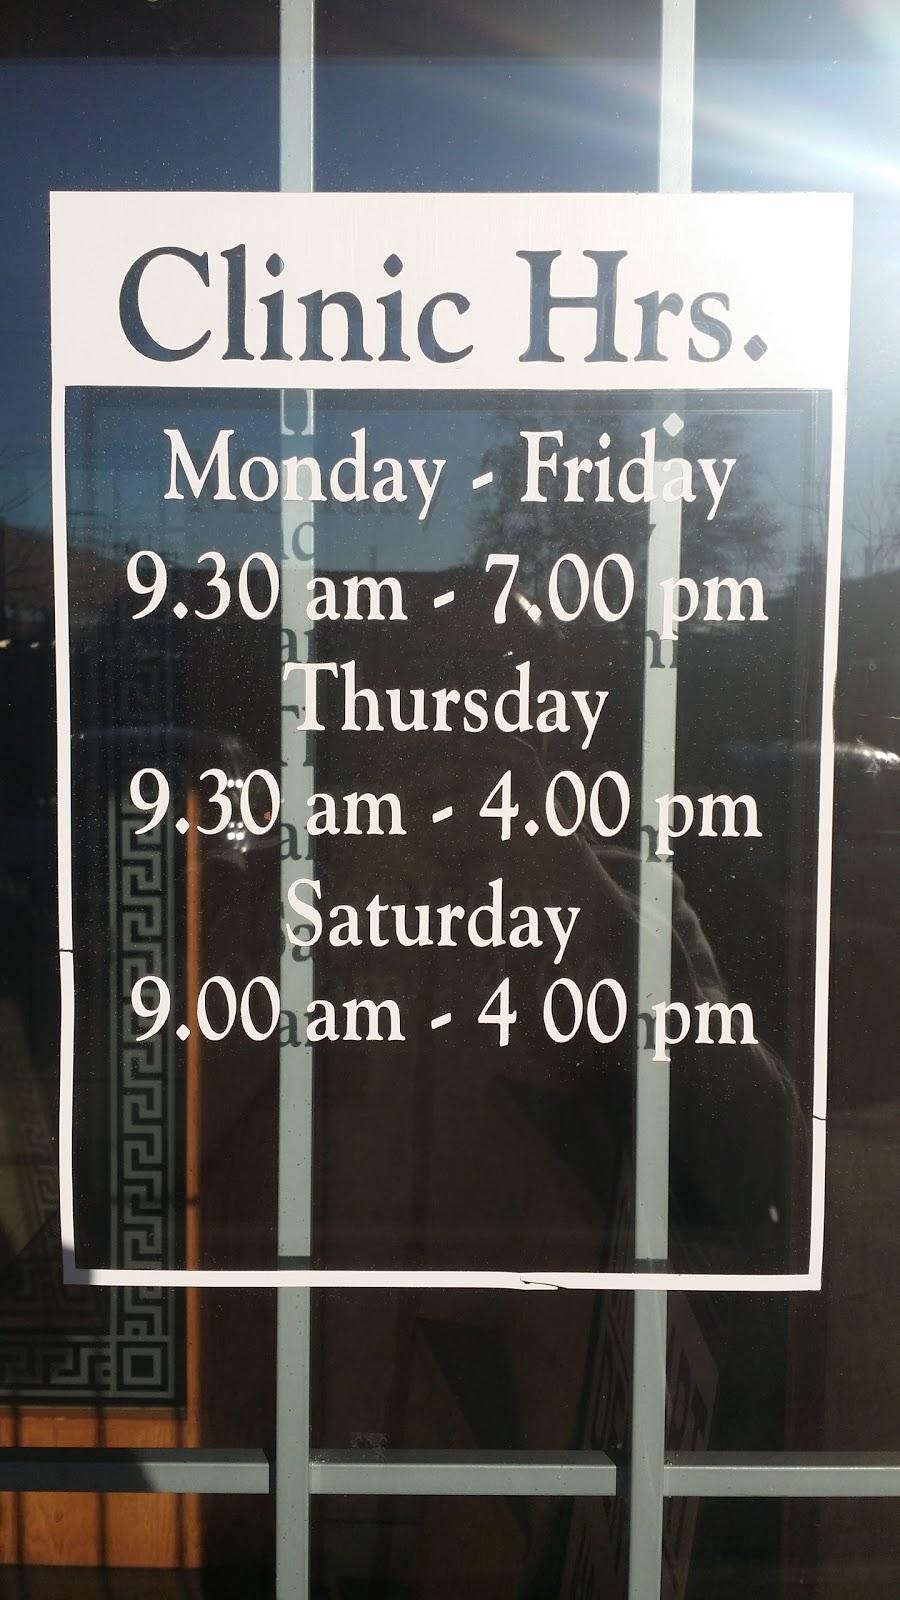 City Heart Dental   dentist   127 Westmore Dr, Etobicoke, ON M9V 3Y6, Canada   4167486684 OR +1 416-748-6684